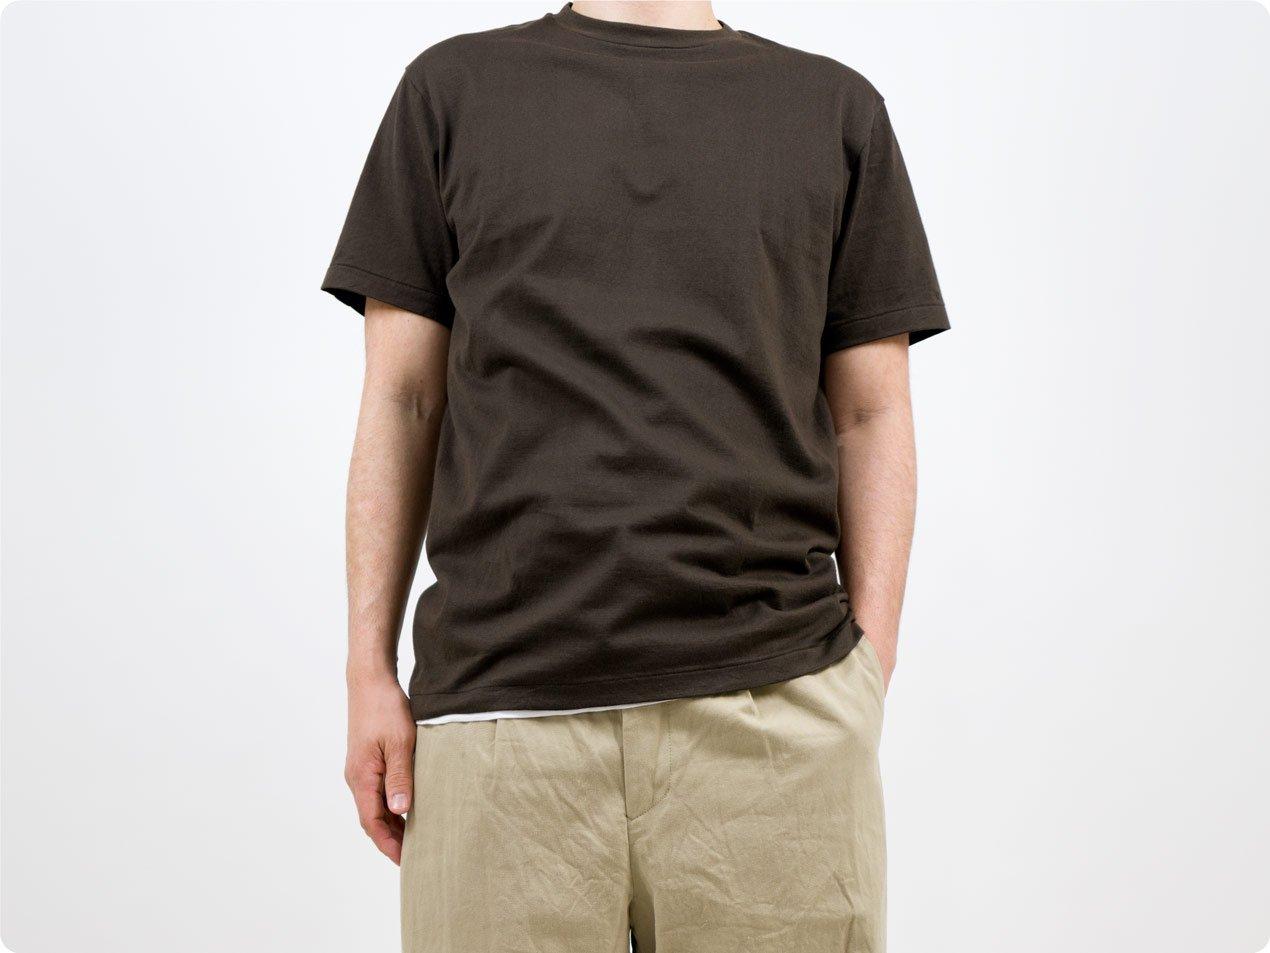 YAECA STOCK 丸胴シルクタッチ 半袖Tシャツ DARK BROWN 〔メンズ〕